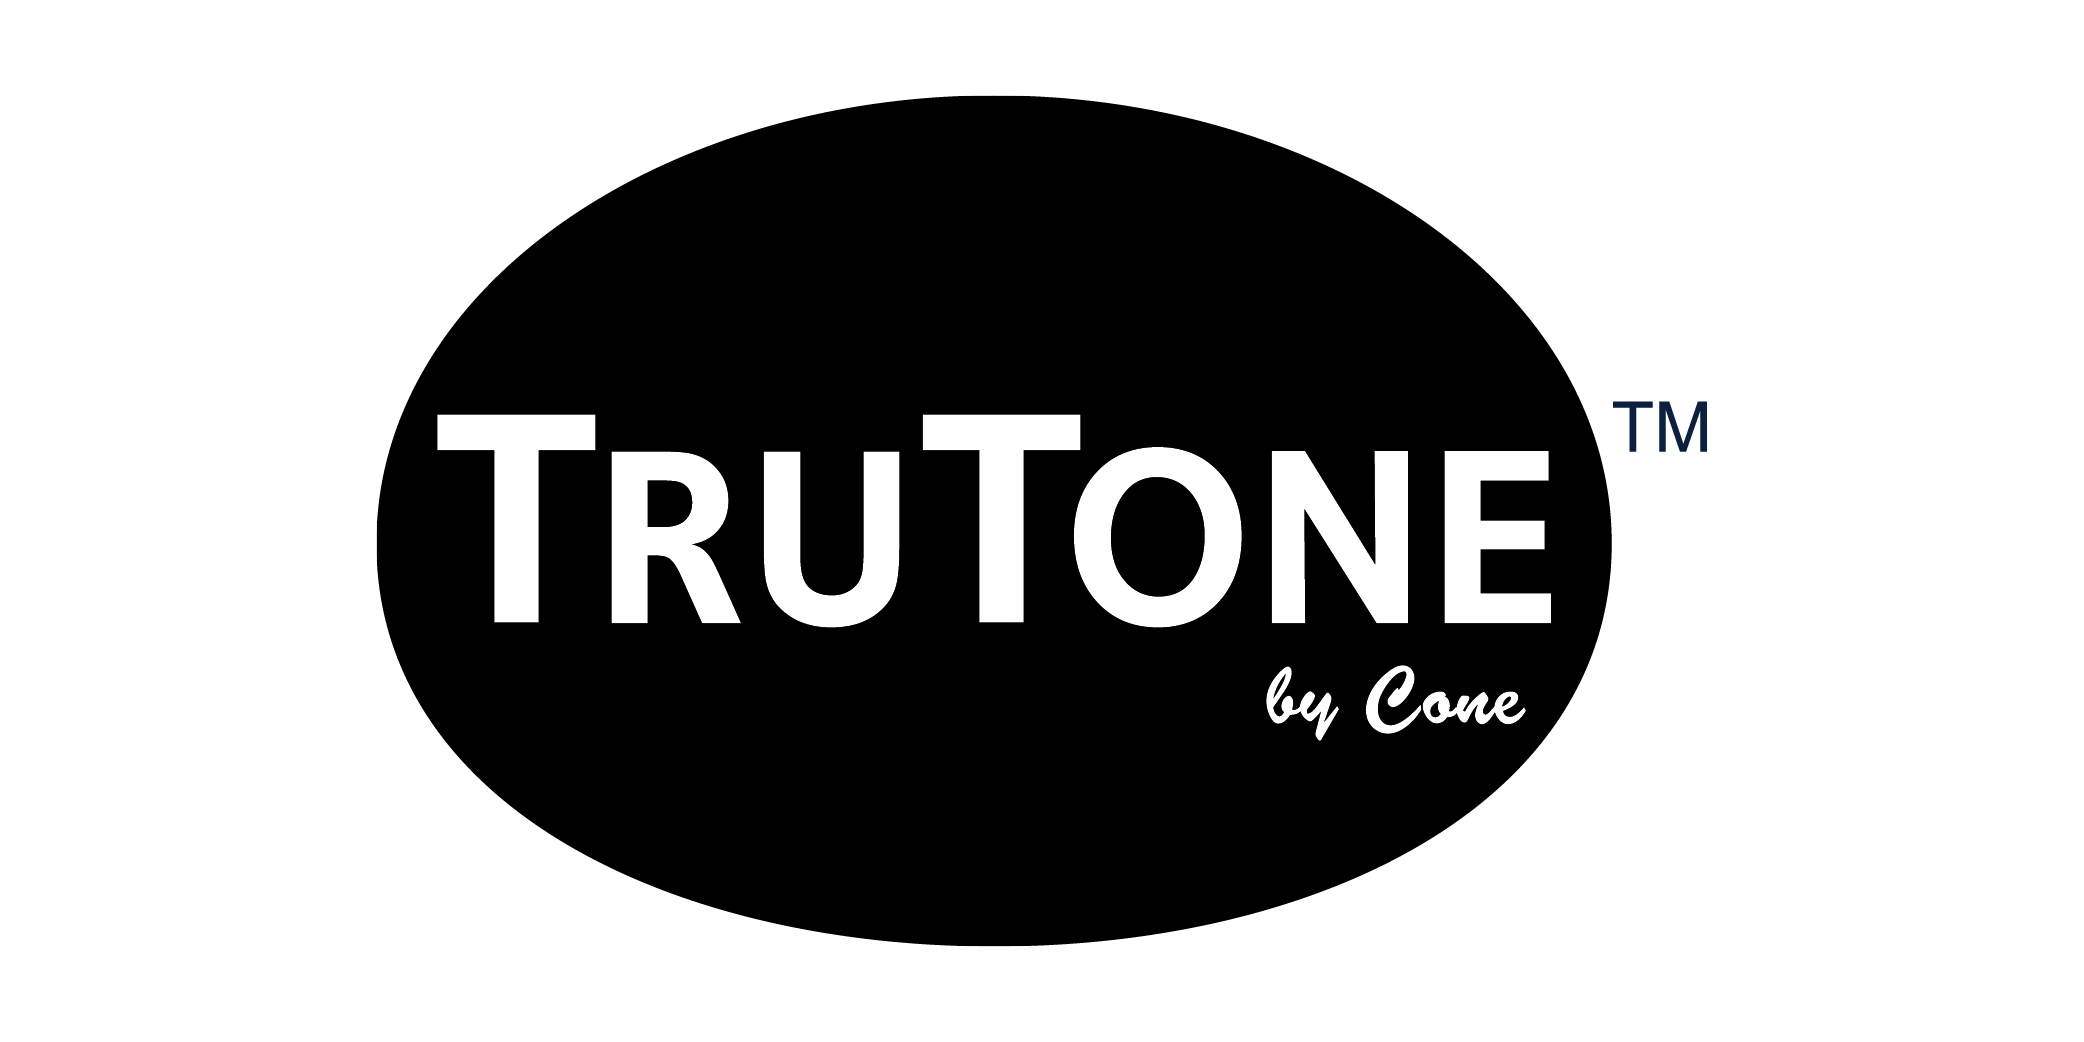 TruTone-01